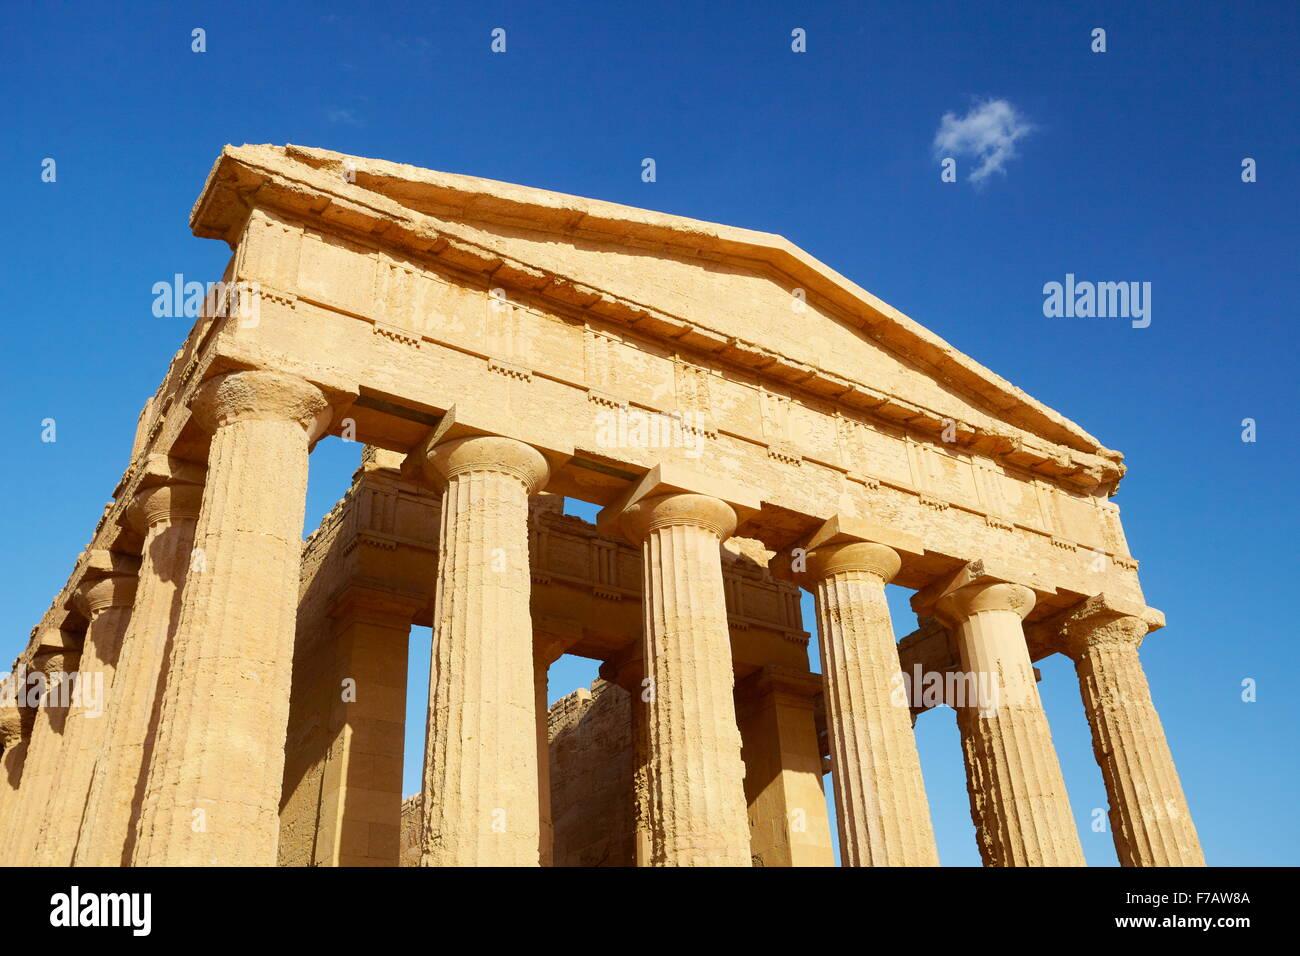 Tempel der Concordia, Tal der Tempel (Valle dei Templi), UNESCO-Agrigento, Sizilien, Italien Stockfoto